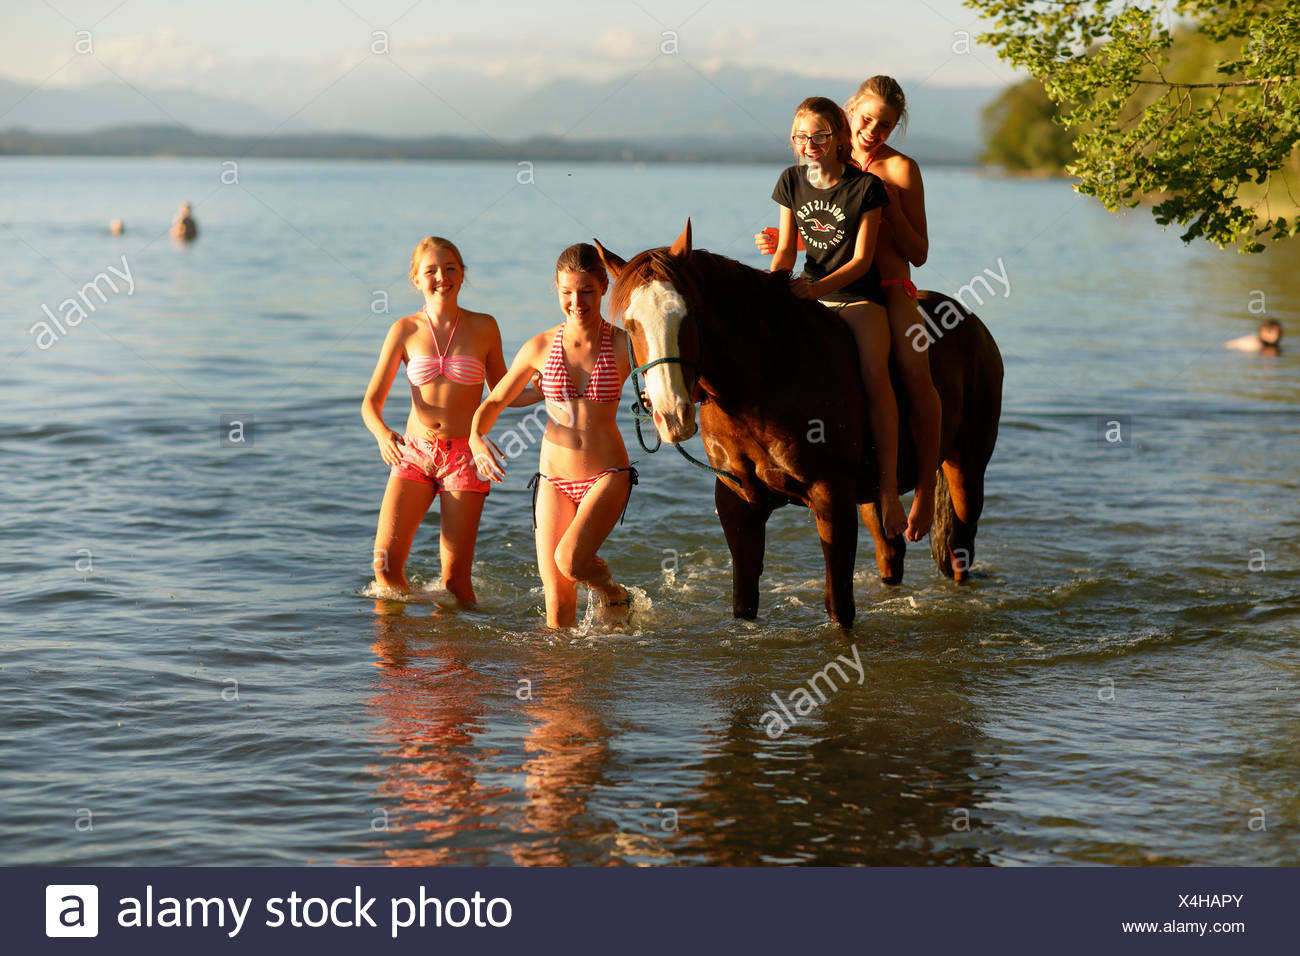 Four girls with a horse in lake Starnberg, Ammerland, Munsing, Upper Bavaria, Germany - Stock Image